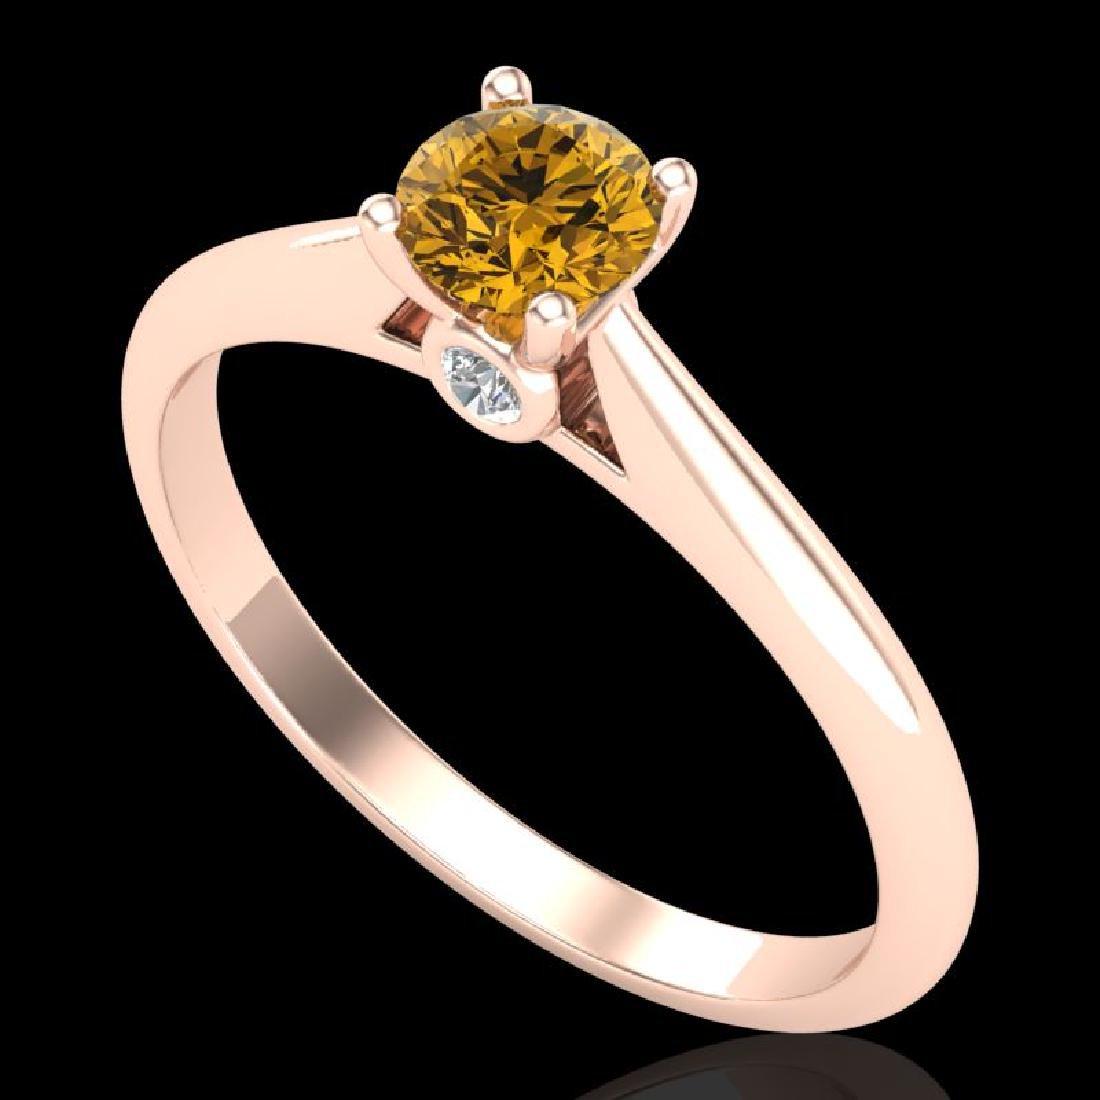 0.4 CTW Intense Fancy Yellow Diamond Engagement Art